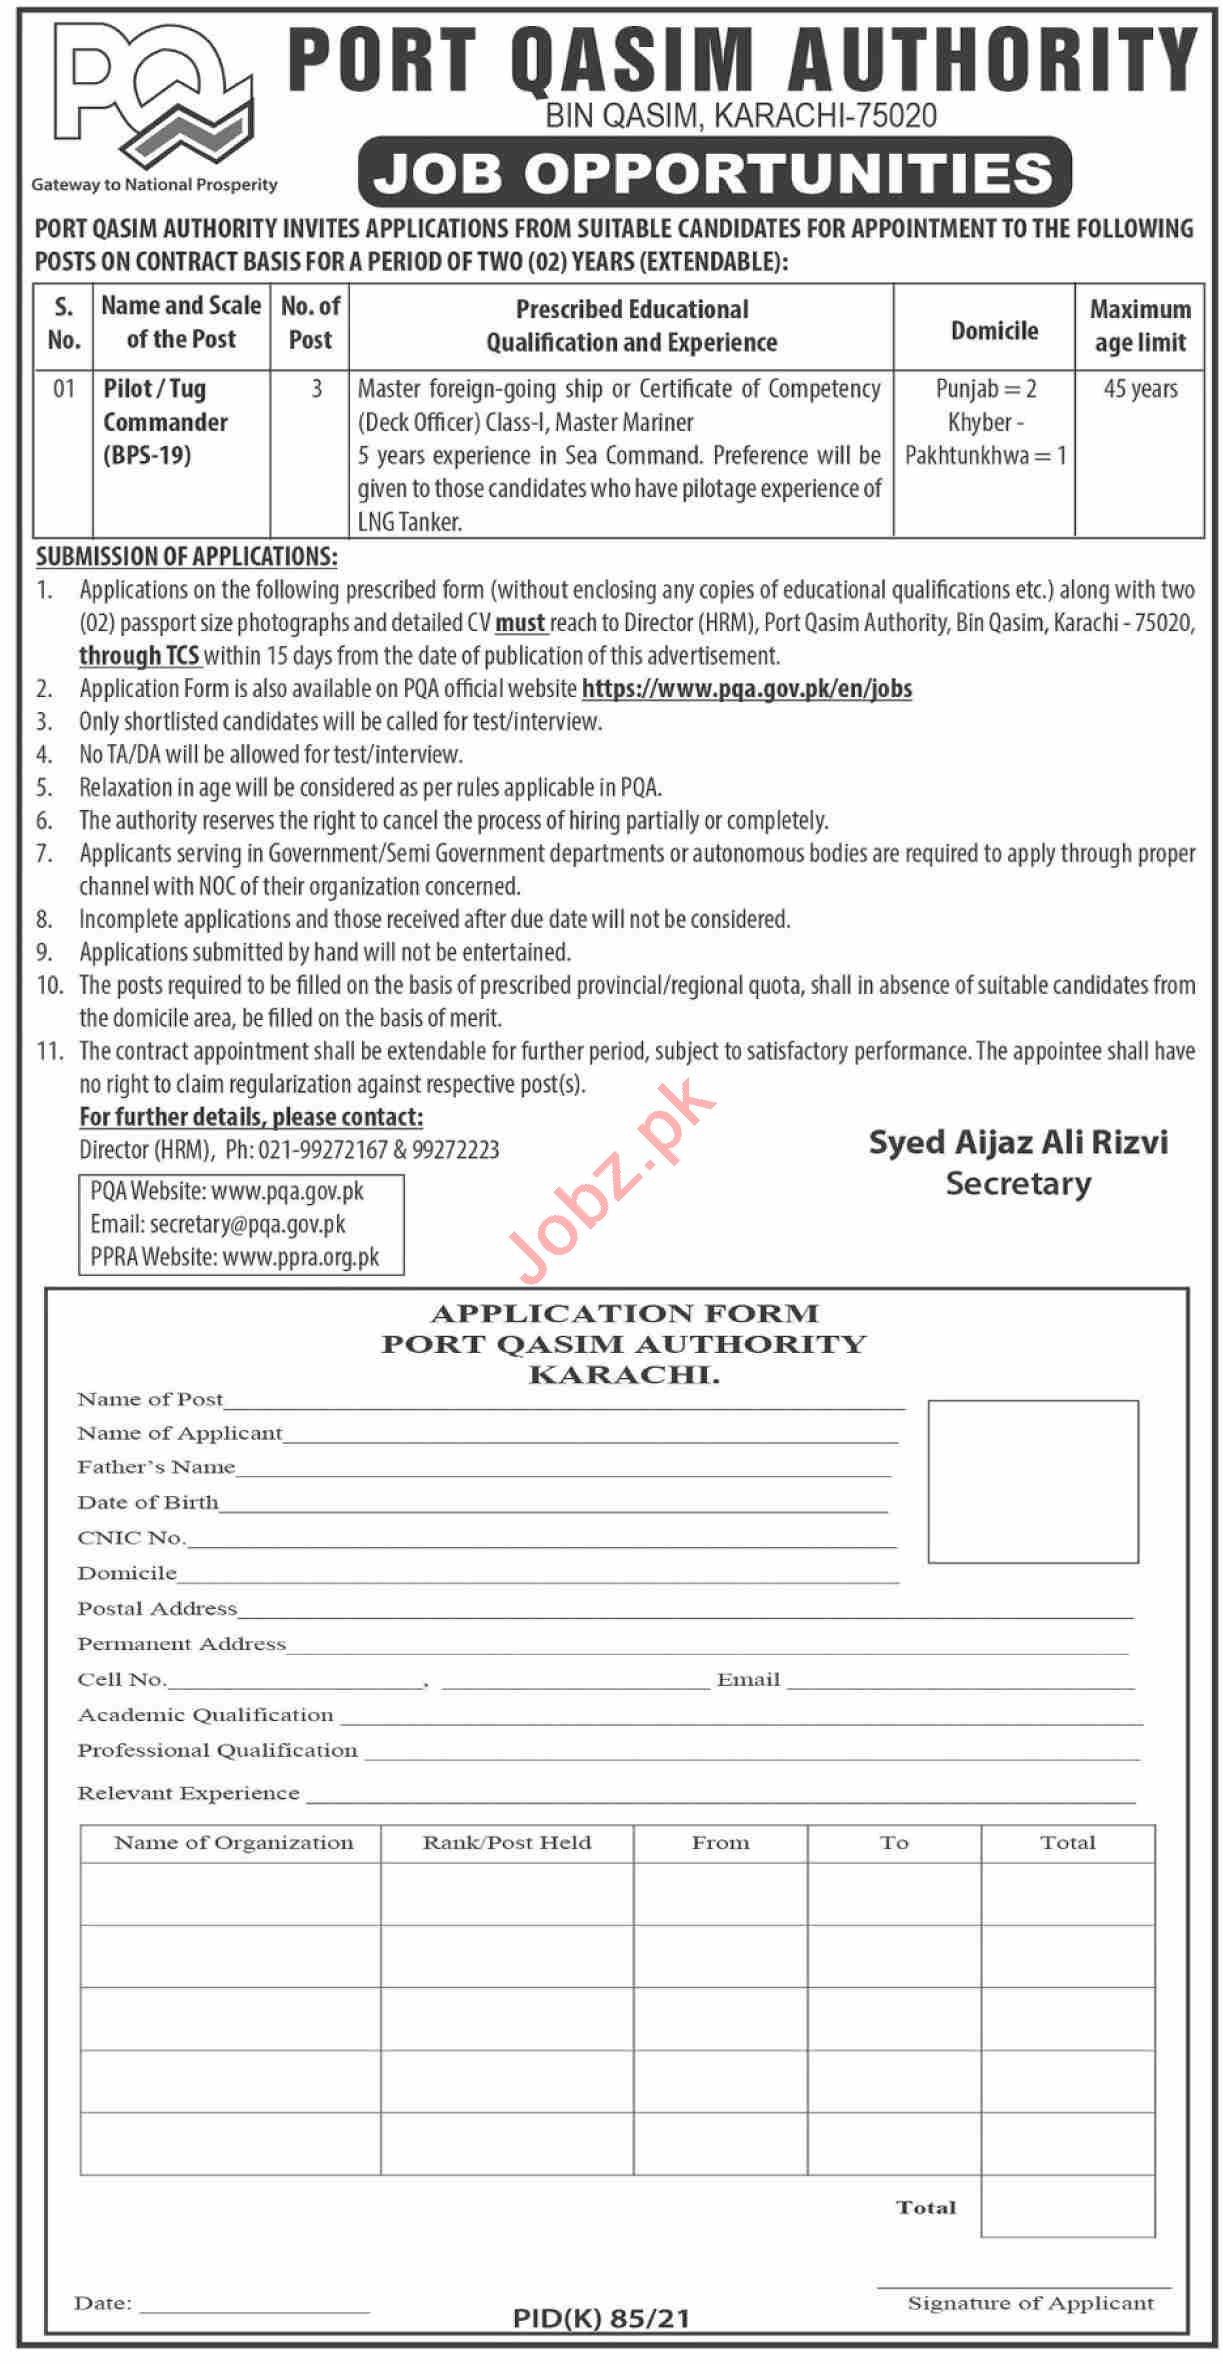 Port Qasim Authority PQA Karachi Jobs 2021 for Tug Commander